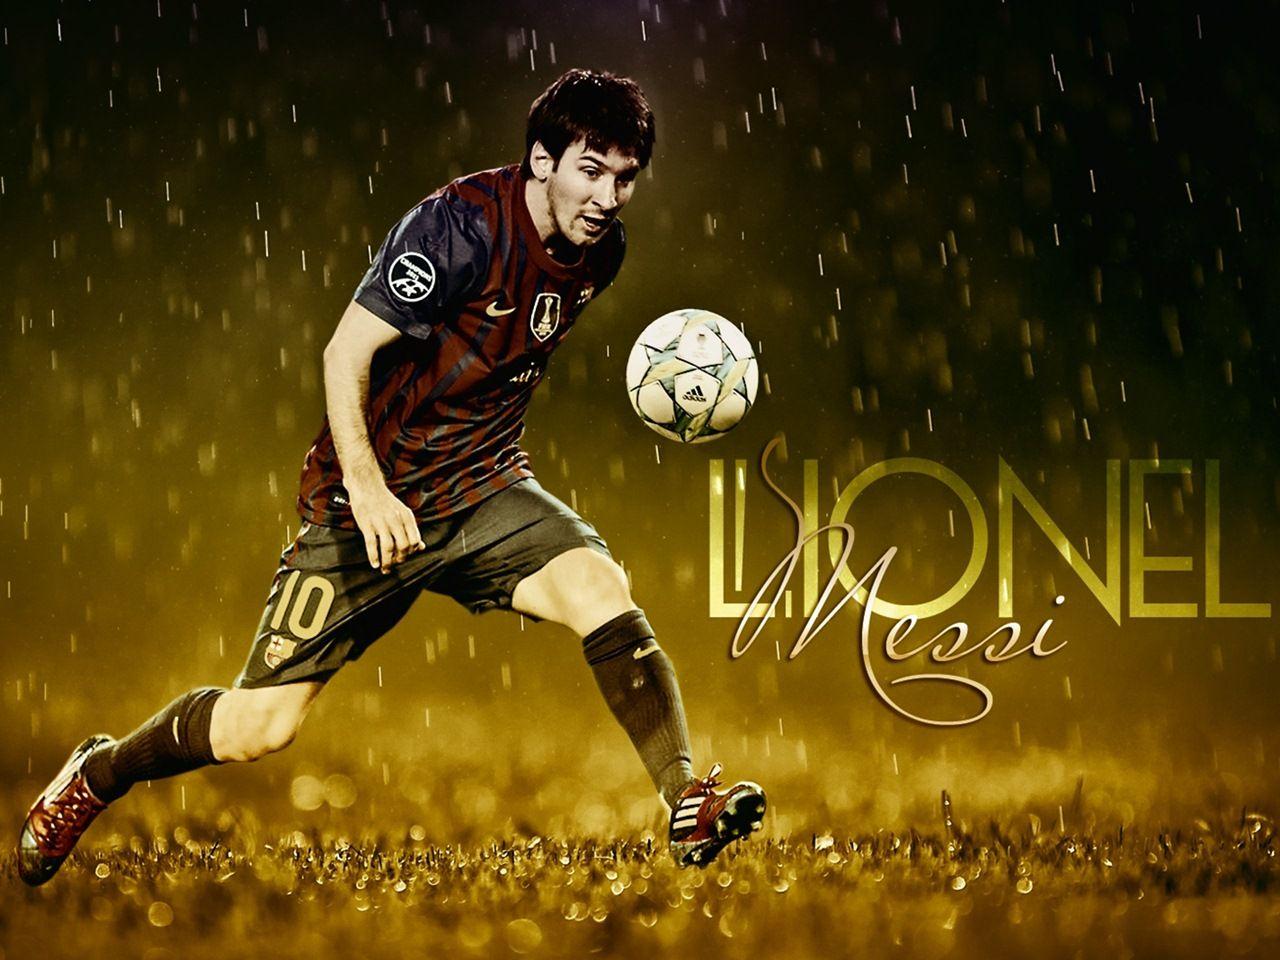 lionel messi hd soccer wallpaper - http://www.wallpapersoccer